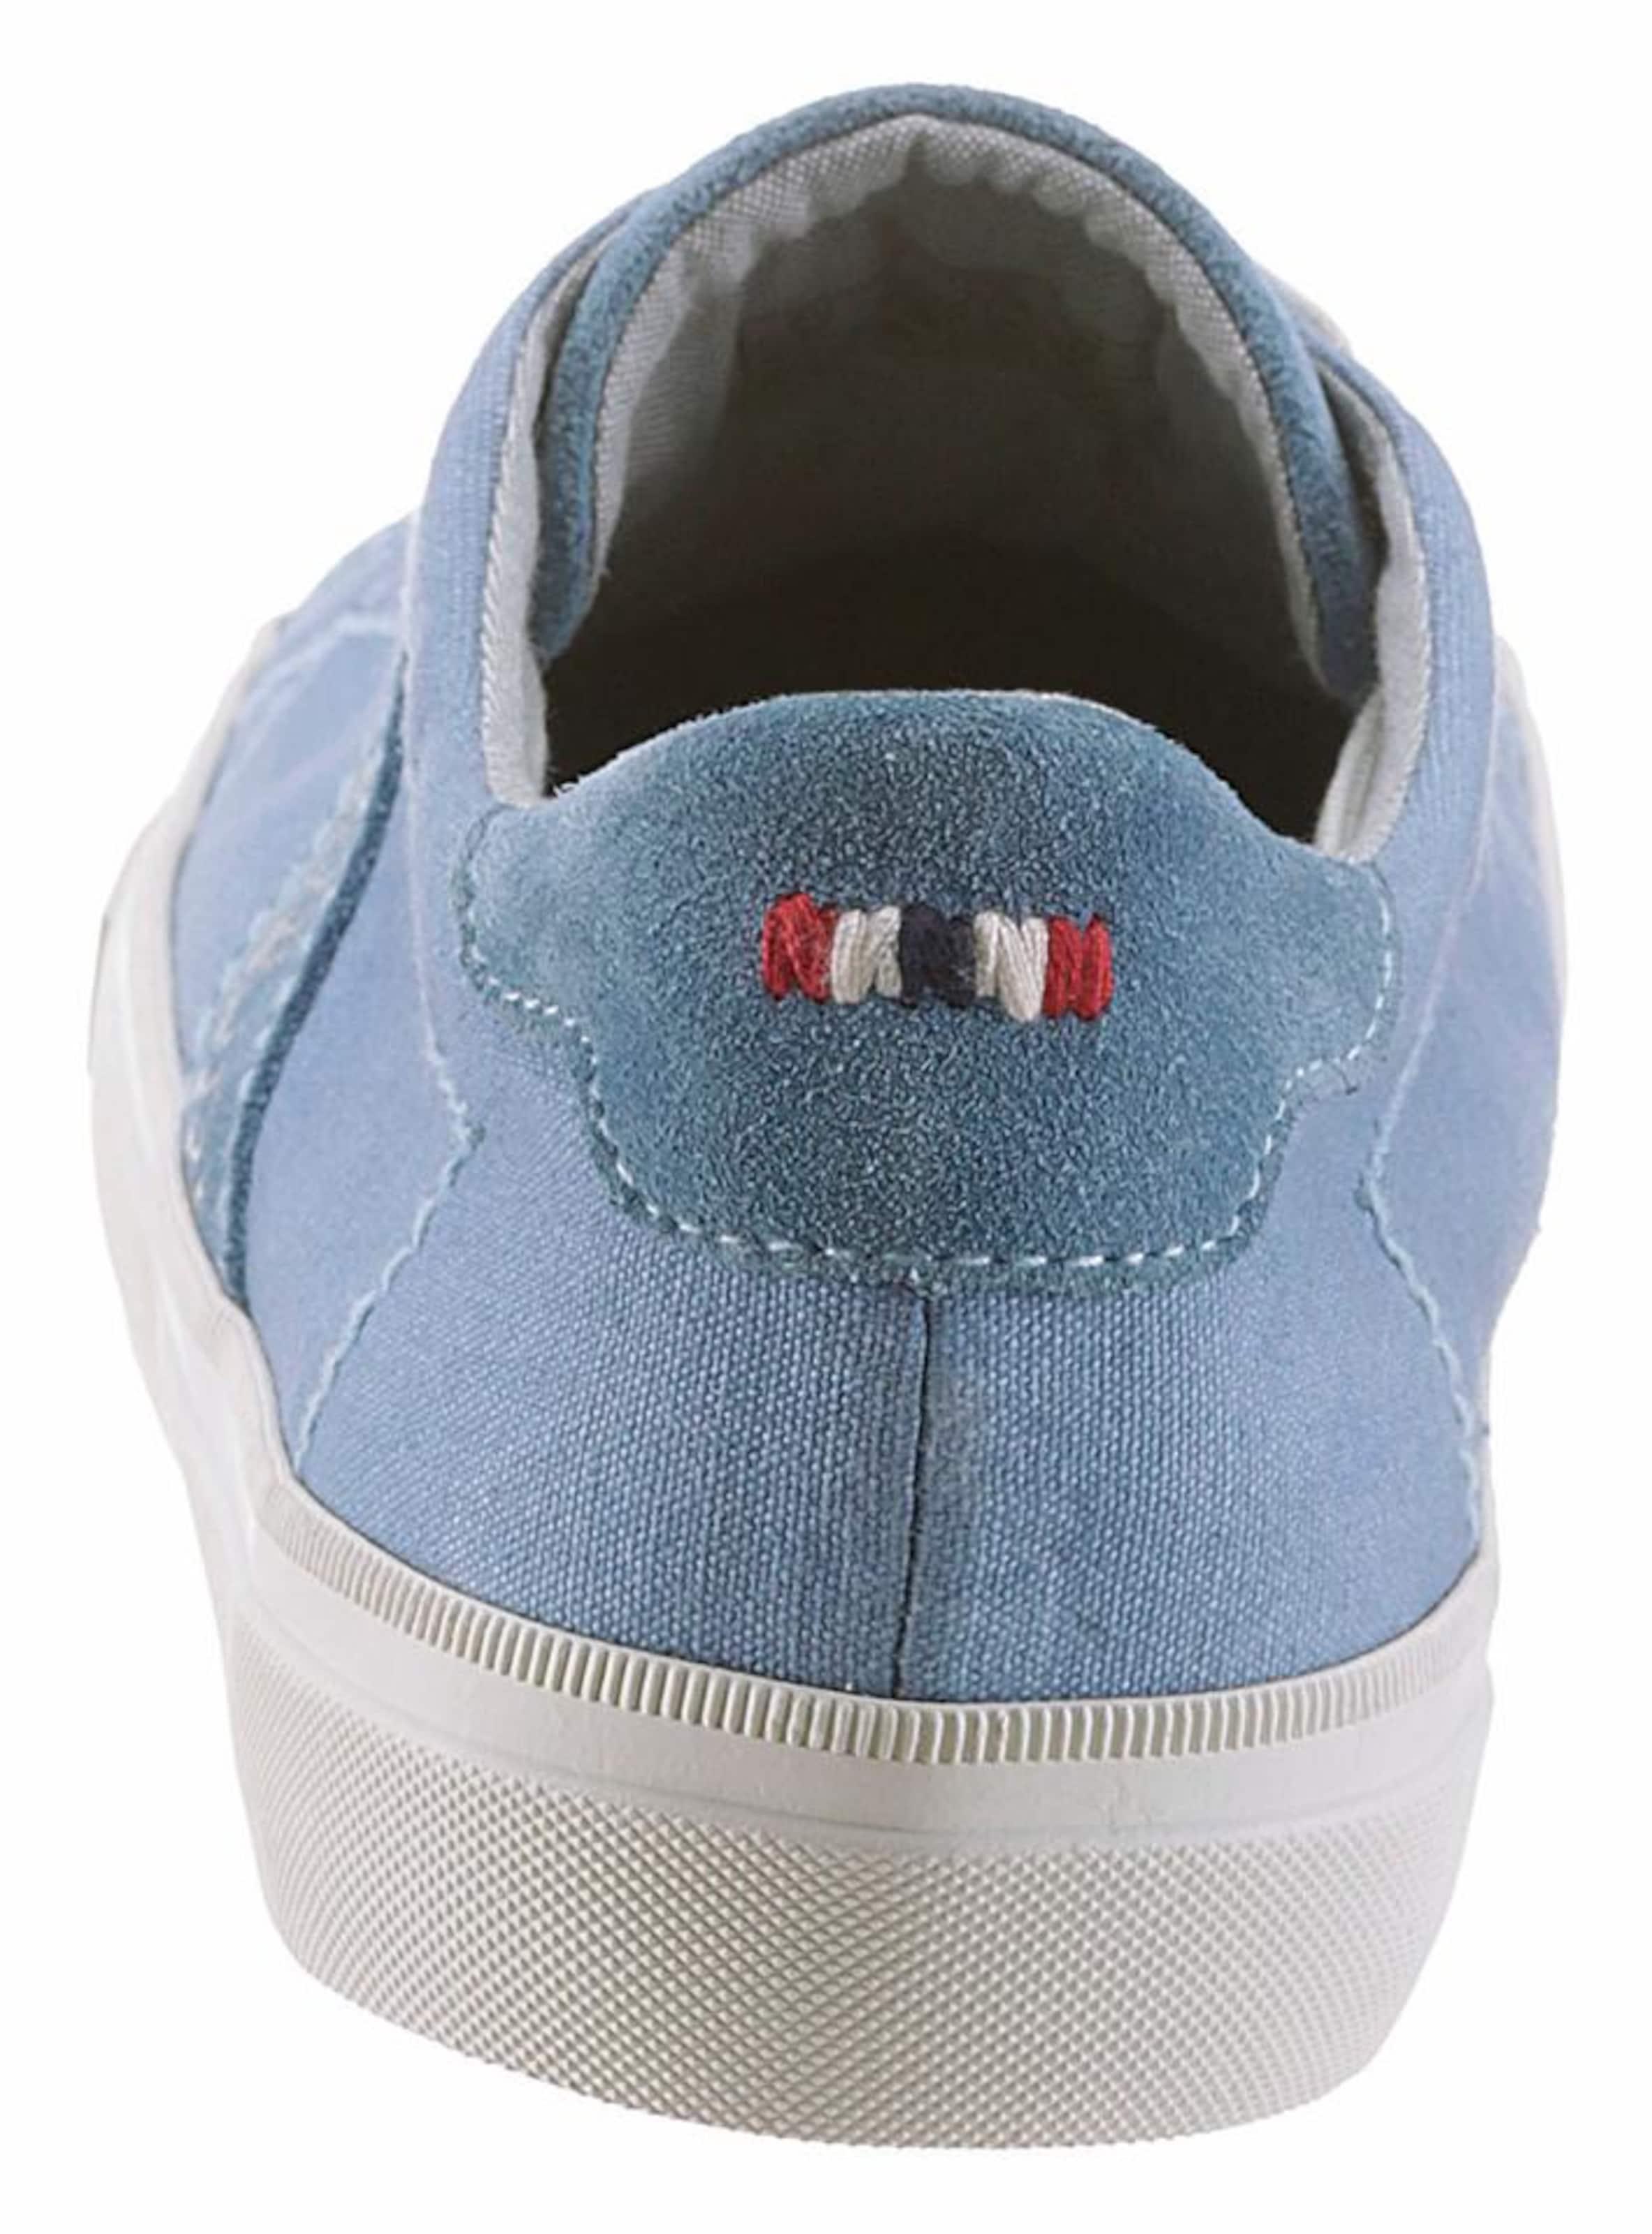 NAPAPIJRI Sneaker 'Naomi' Rabatt Neue Ankunft Billig Online-Shop Manchester Spielraum Niedriger Preis 5v7xS3WY